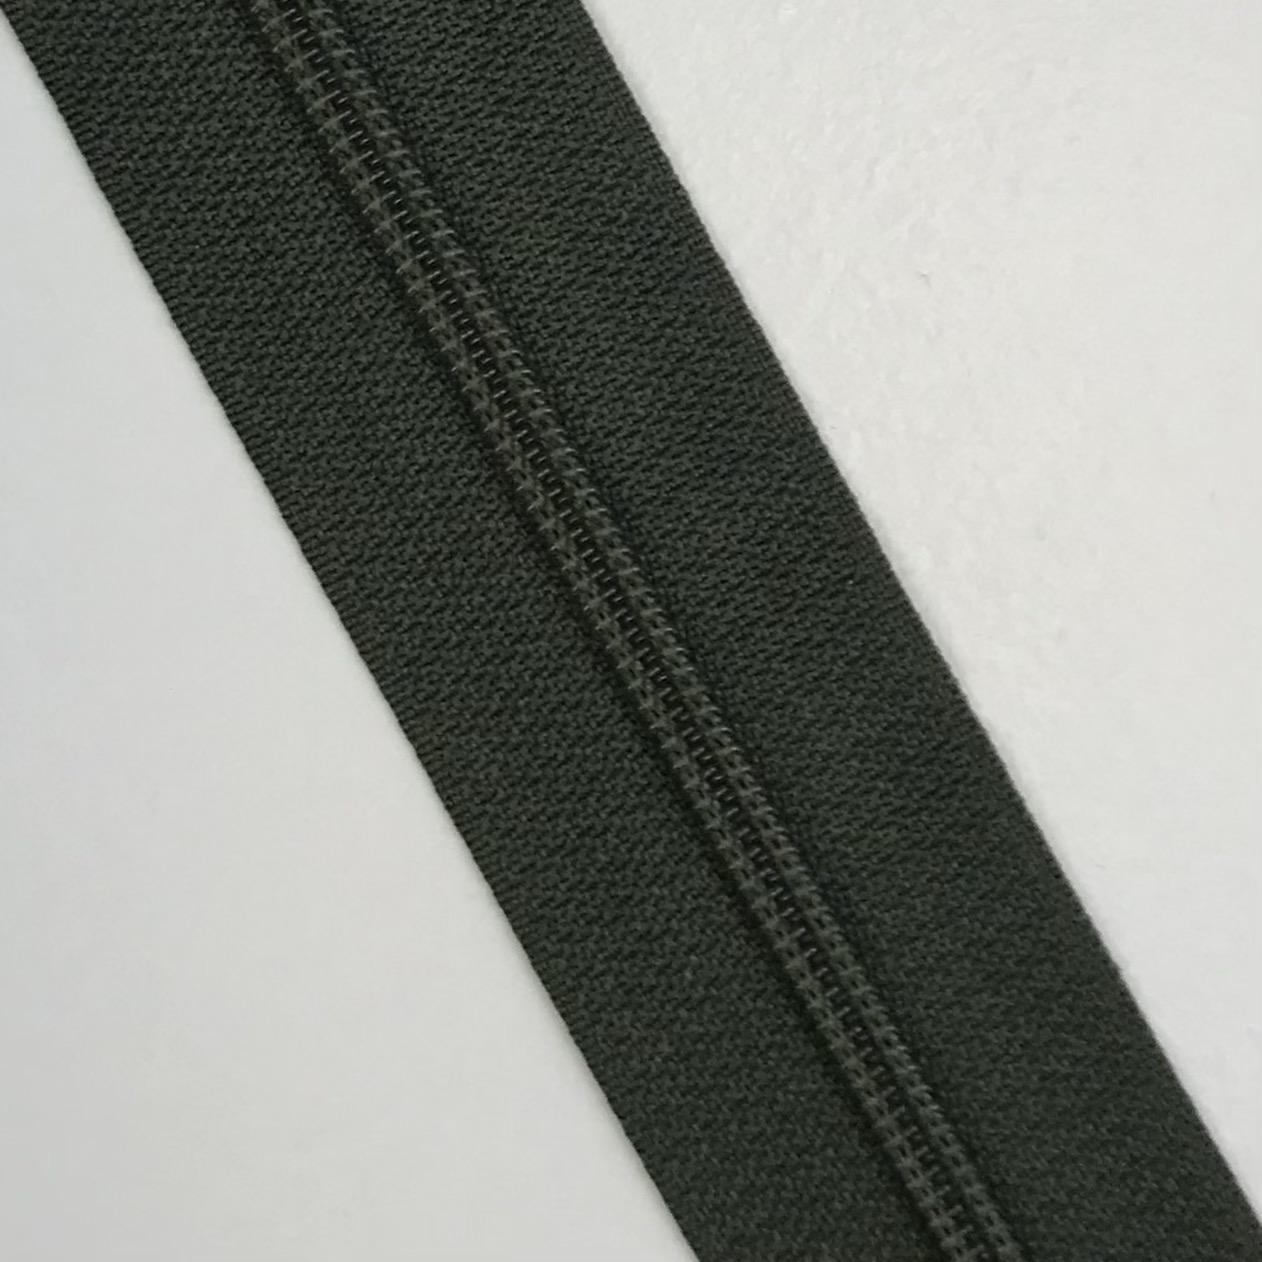 Endlosreißverschluss Meterware 3 mm, Union Knopf, olivgrün, Farbe 36. Art. 4511